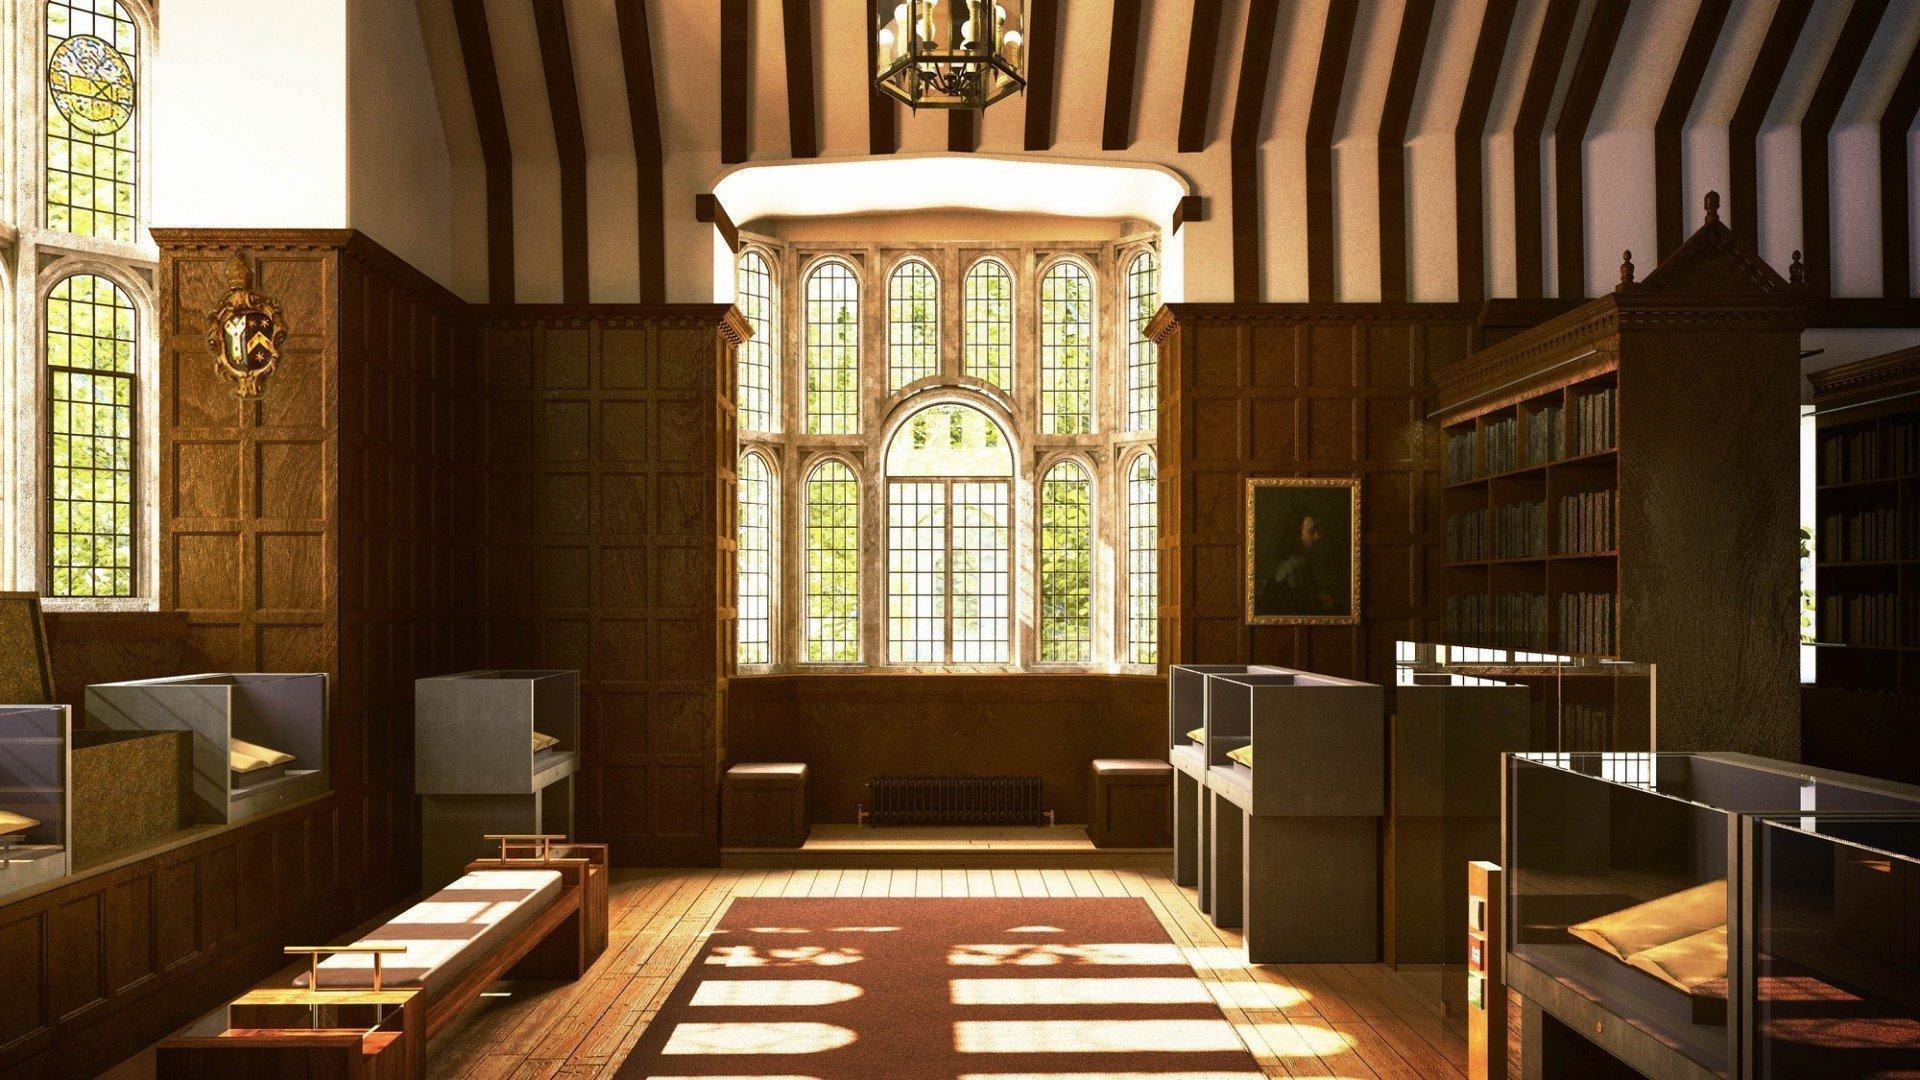 Beard starts work on £10m St John's College historic library refurbishment